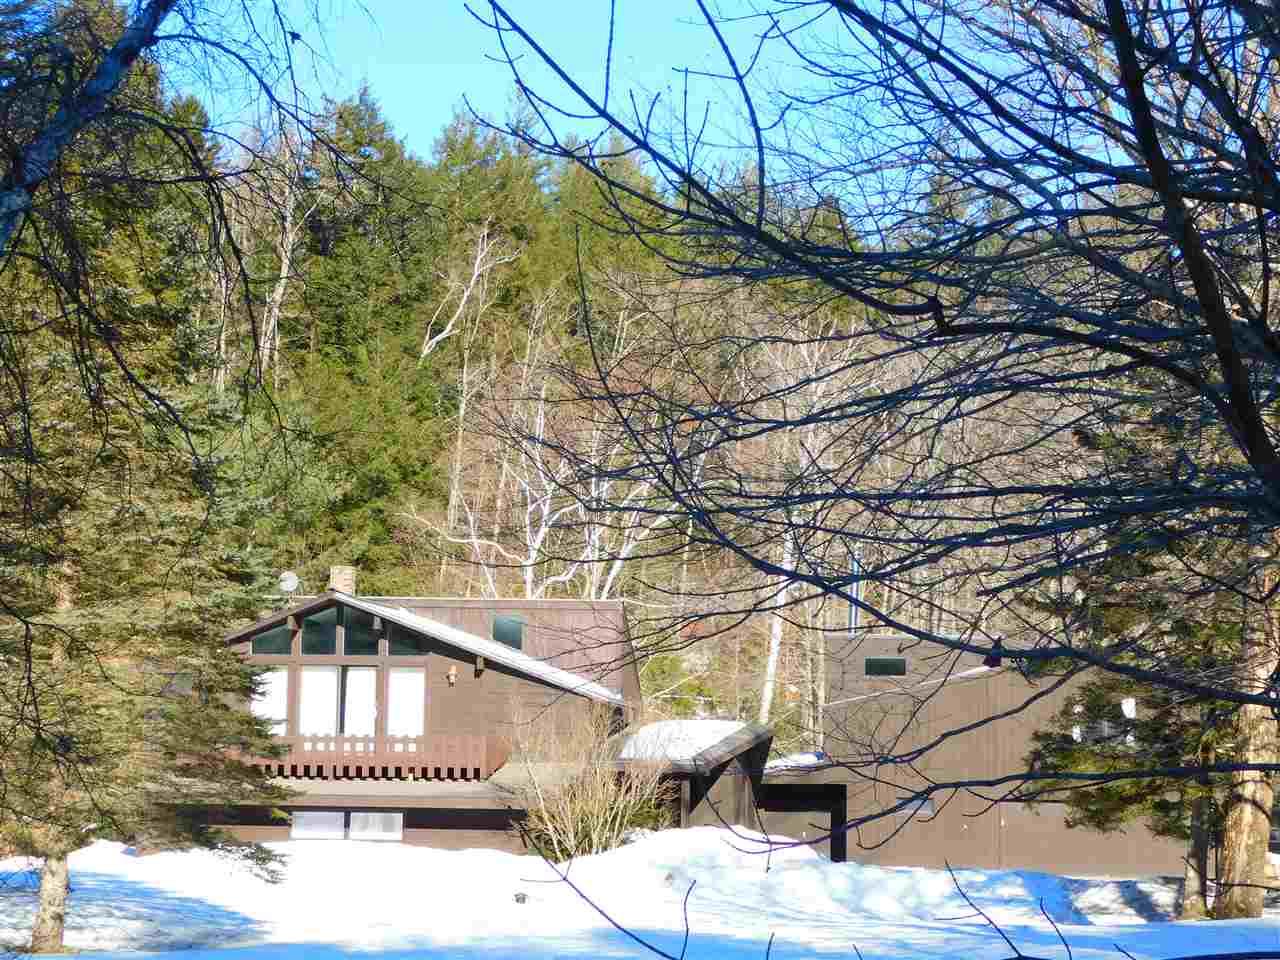 Mount-Snow-Real-Estate-4463107-0